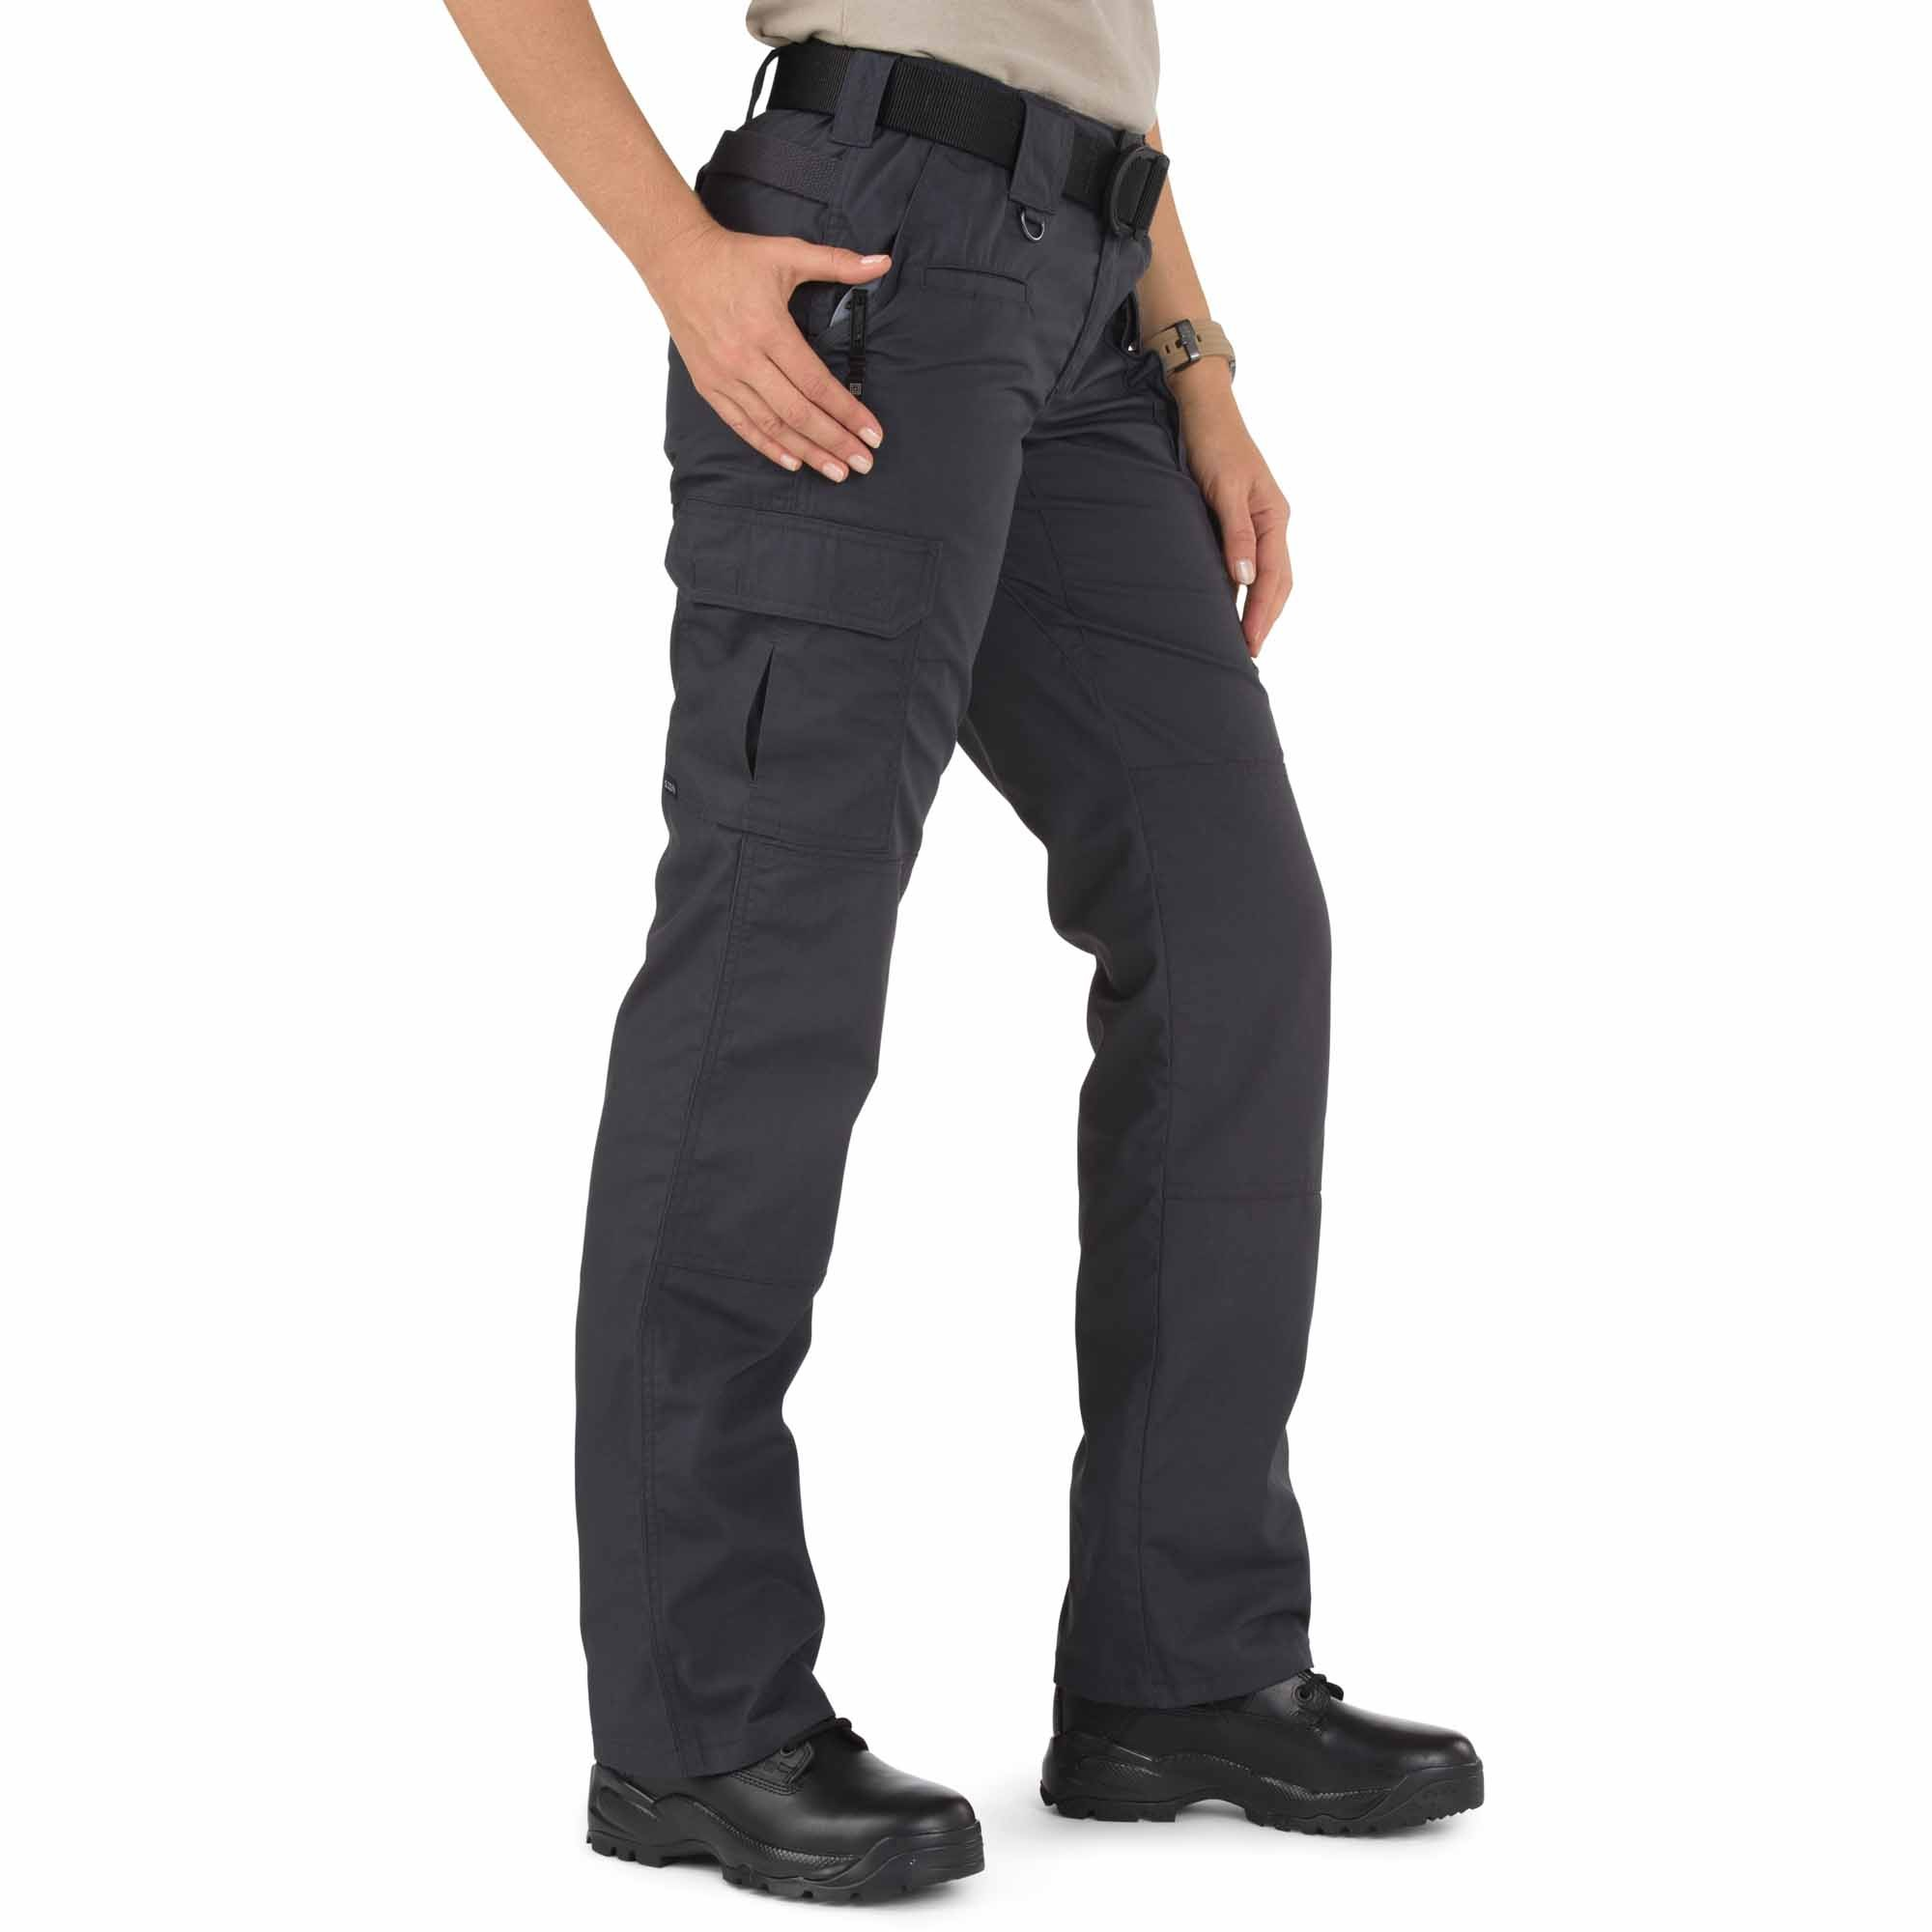 5.11 Women's Taclite Pro Pants – Charcoal